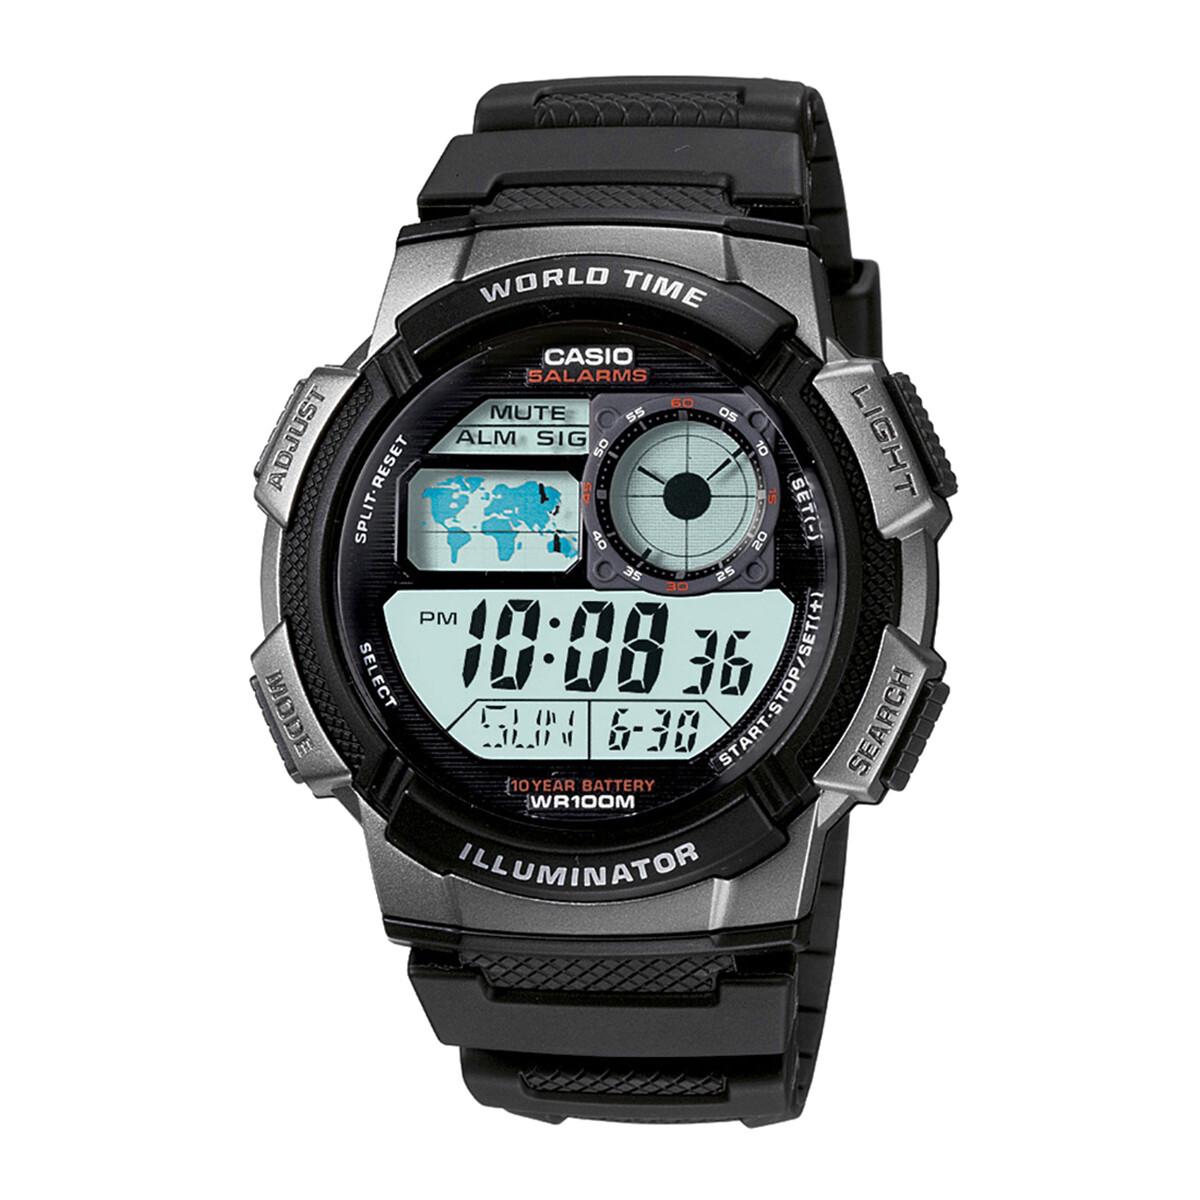 Casio AE-1000W-1BVDF Black Resin Watch For Men